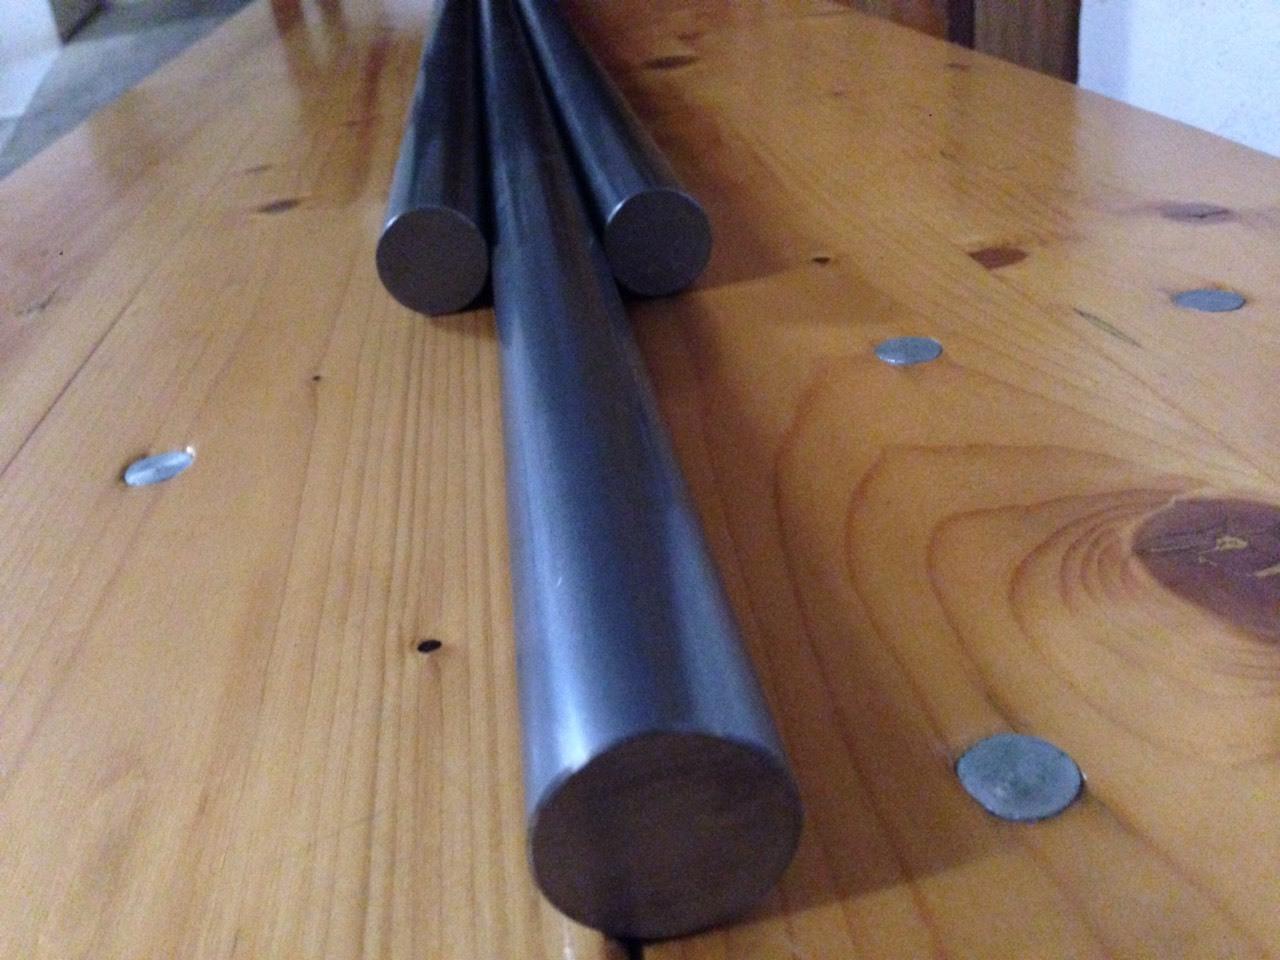 rundstahl 8 mm rundstahl 8 mm rundstab vollmaterial profil edelstahl 8 mm 8 mm rundstahl. Black Bedroom Furniture Sets. Home Design Ideas